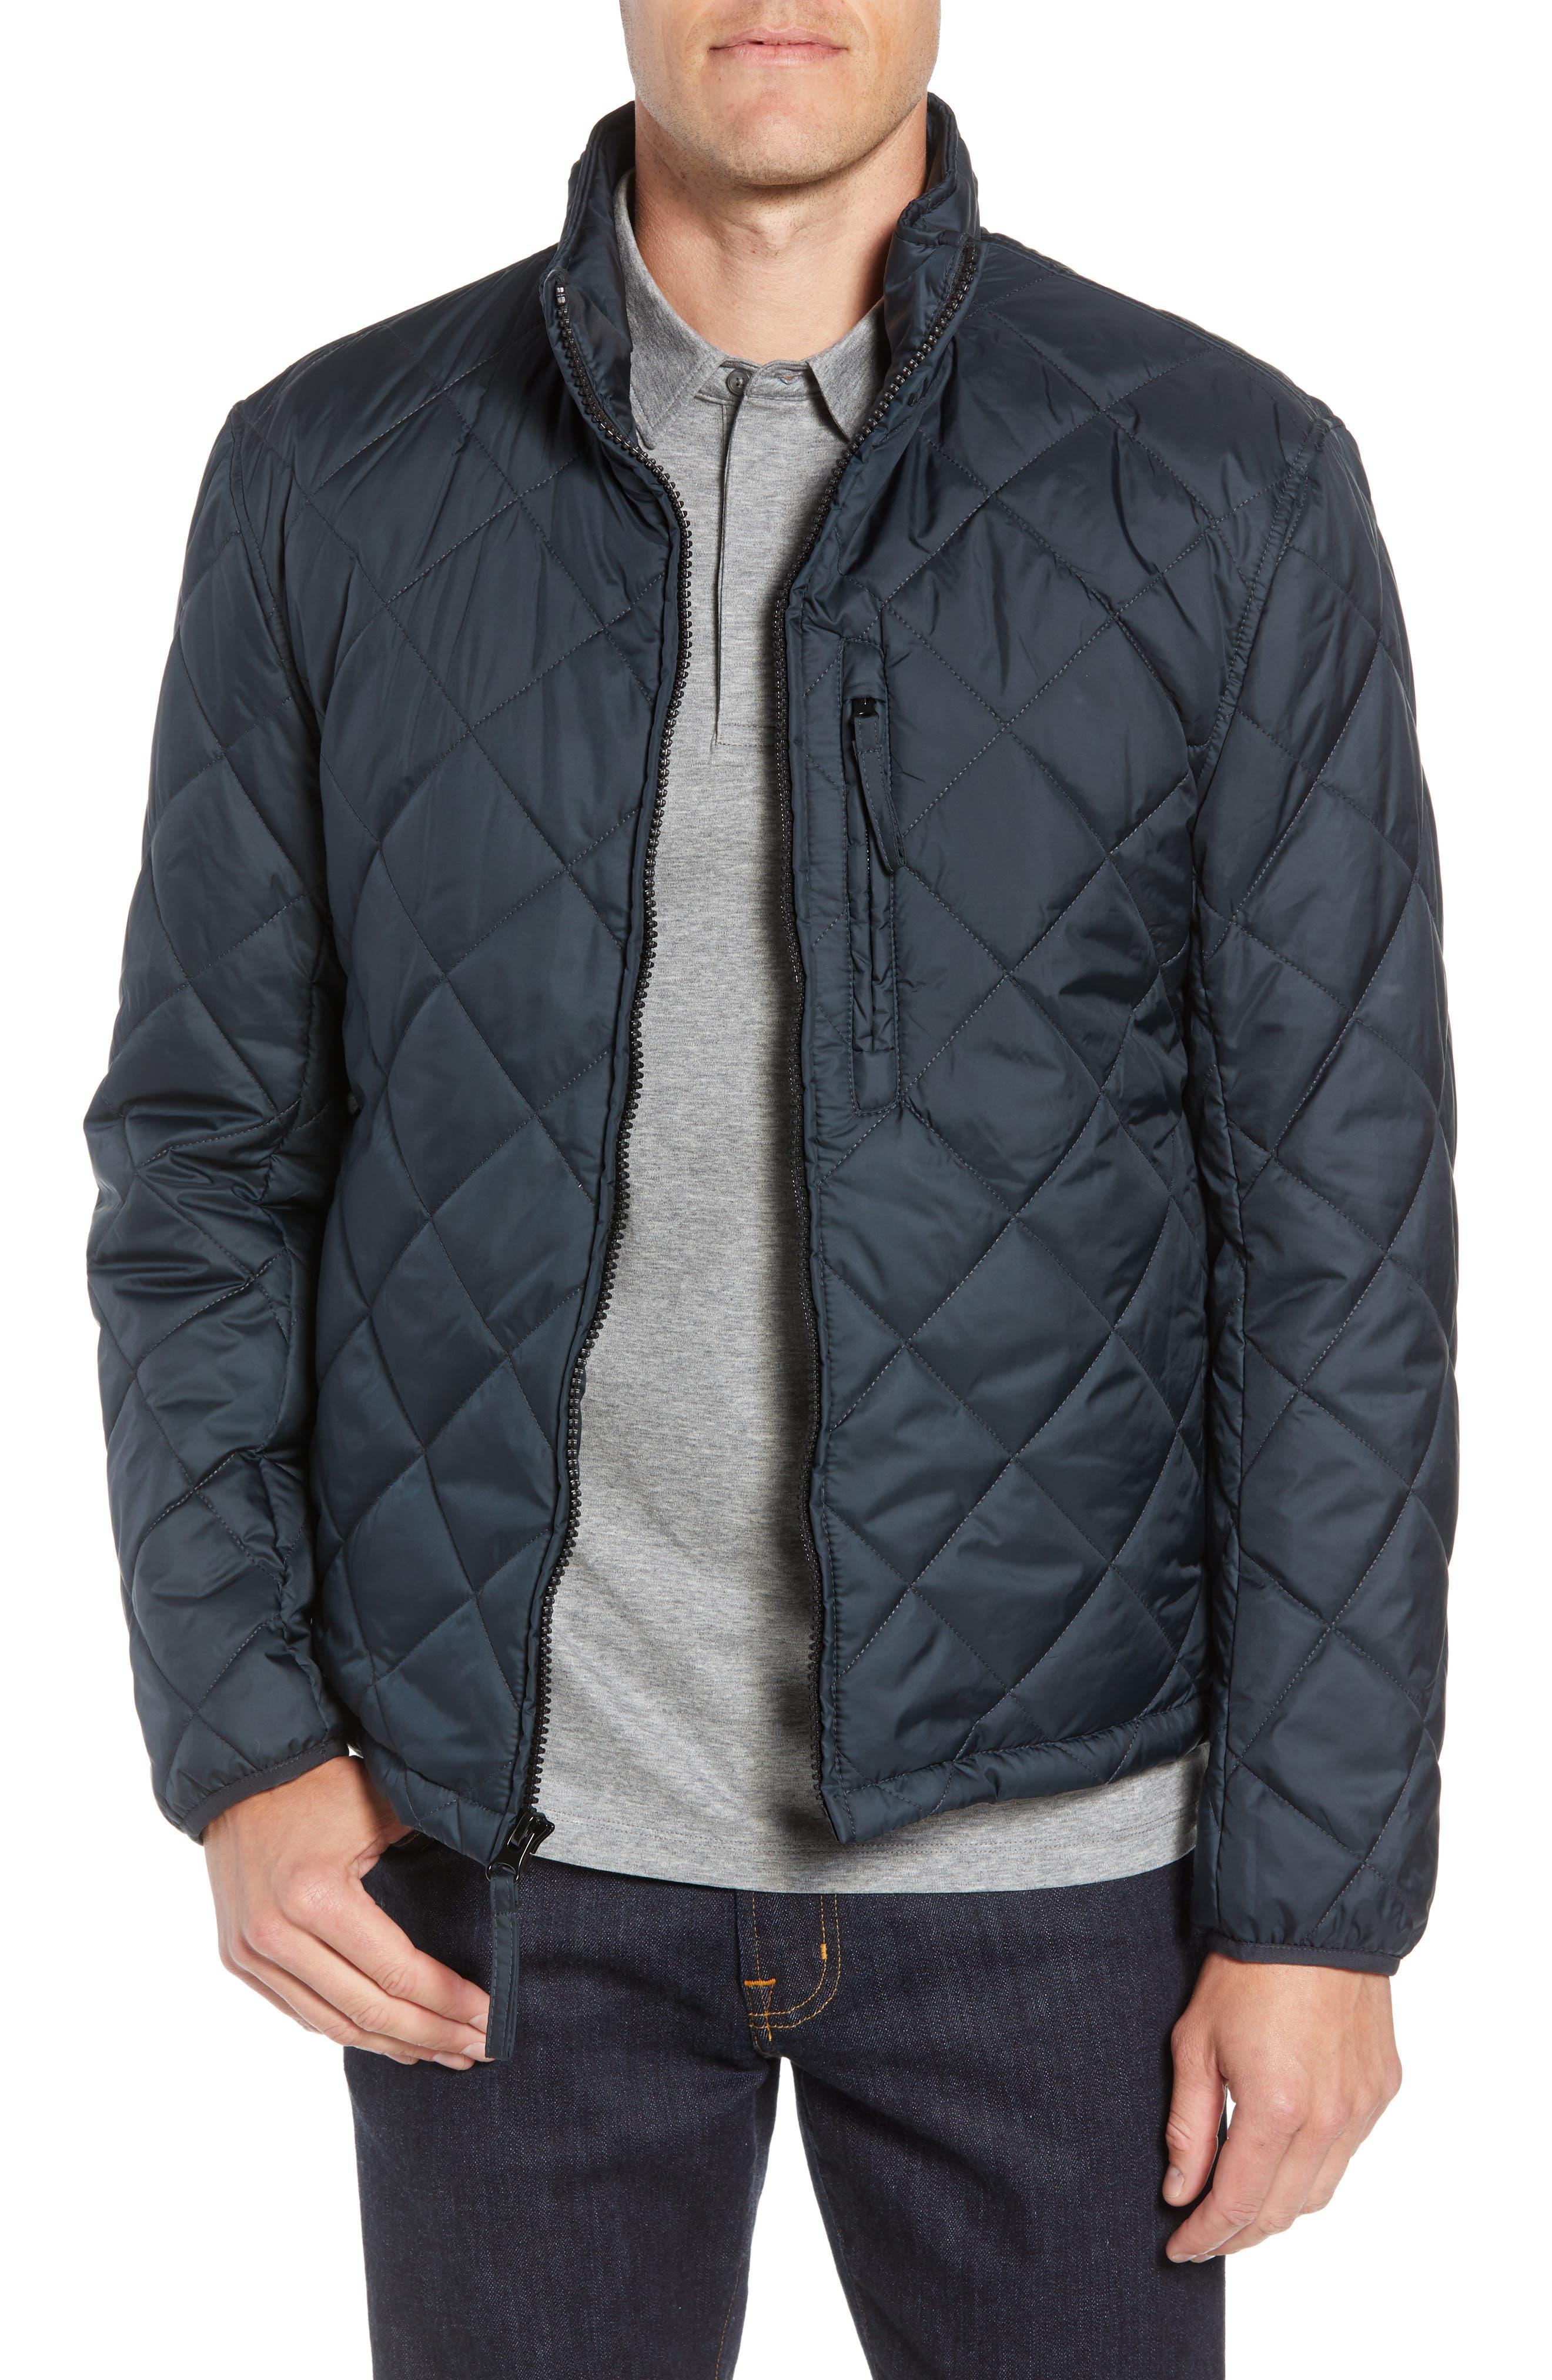 MARC NEW YORK Humboldt Quilted Jacket, Main, color, BLACK